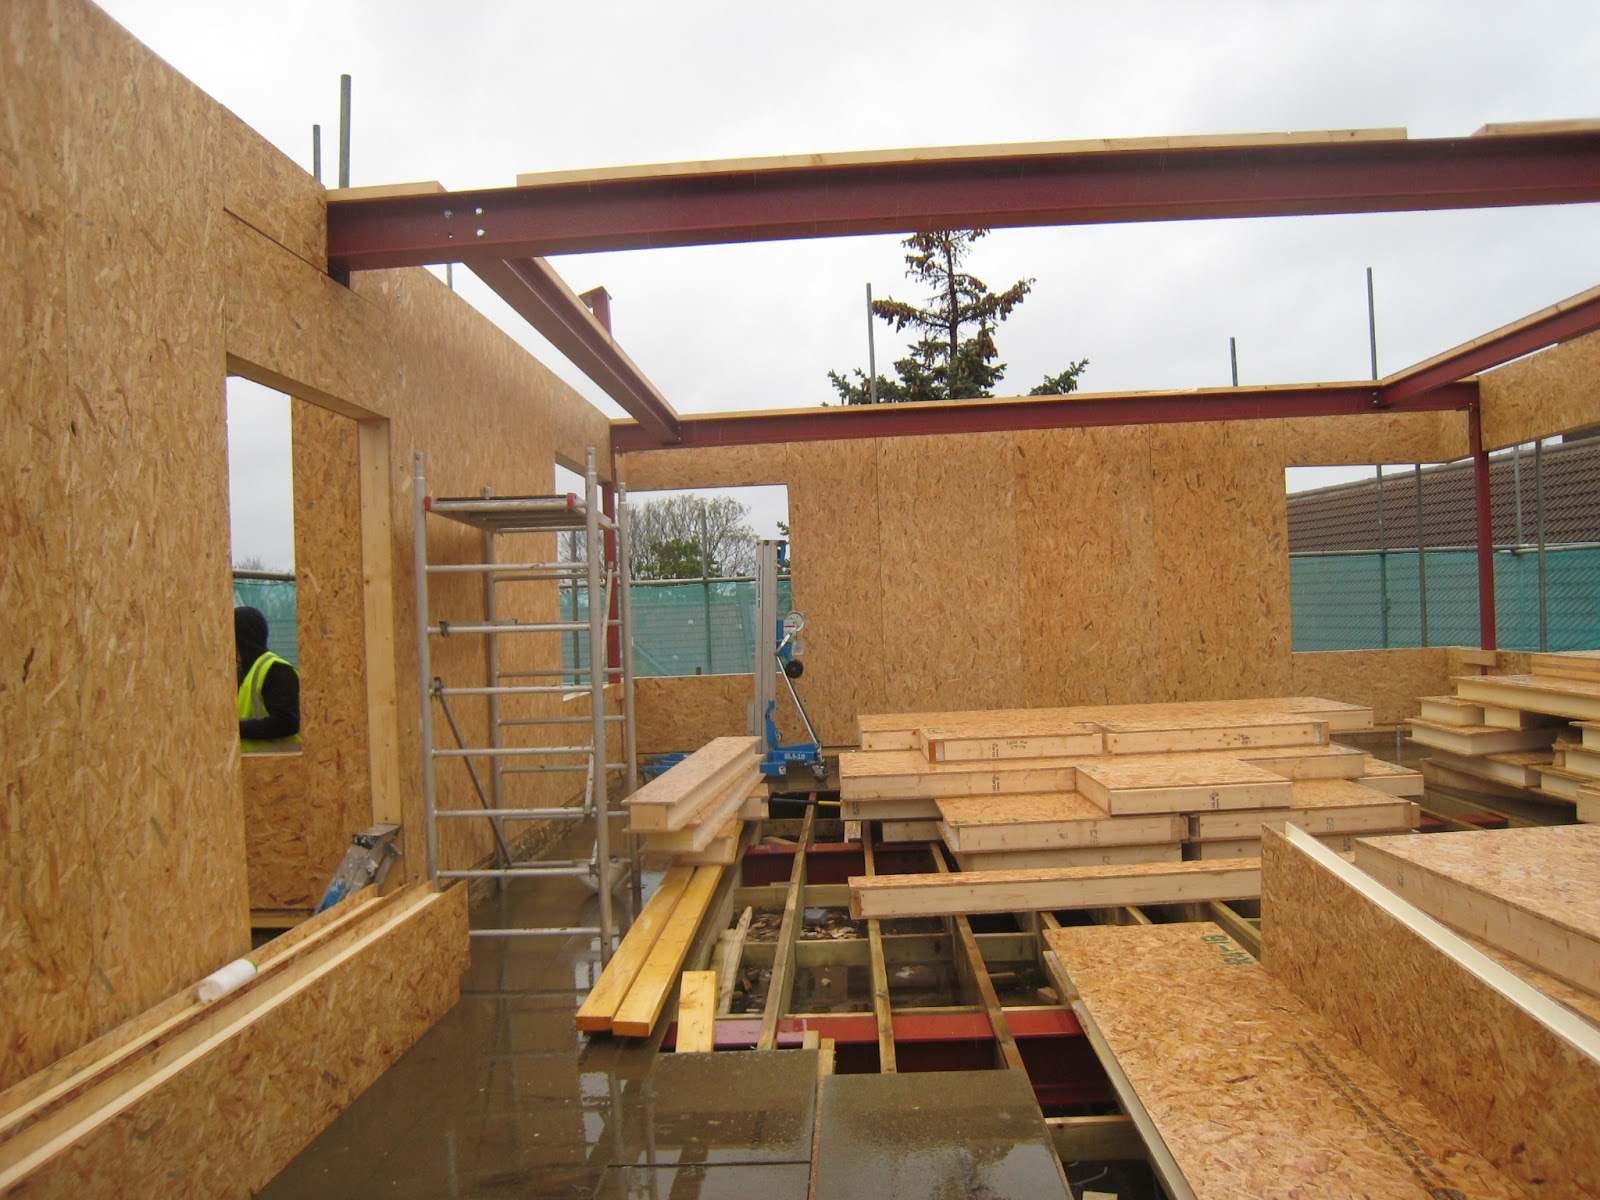 Designbox Architecture March 2013